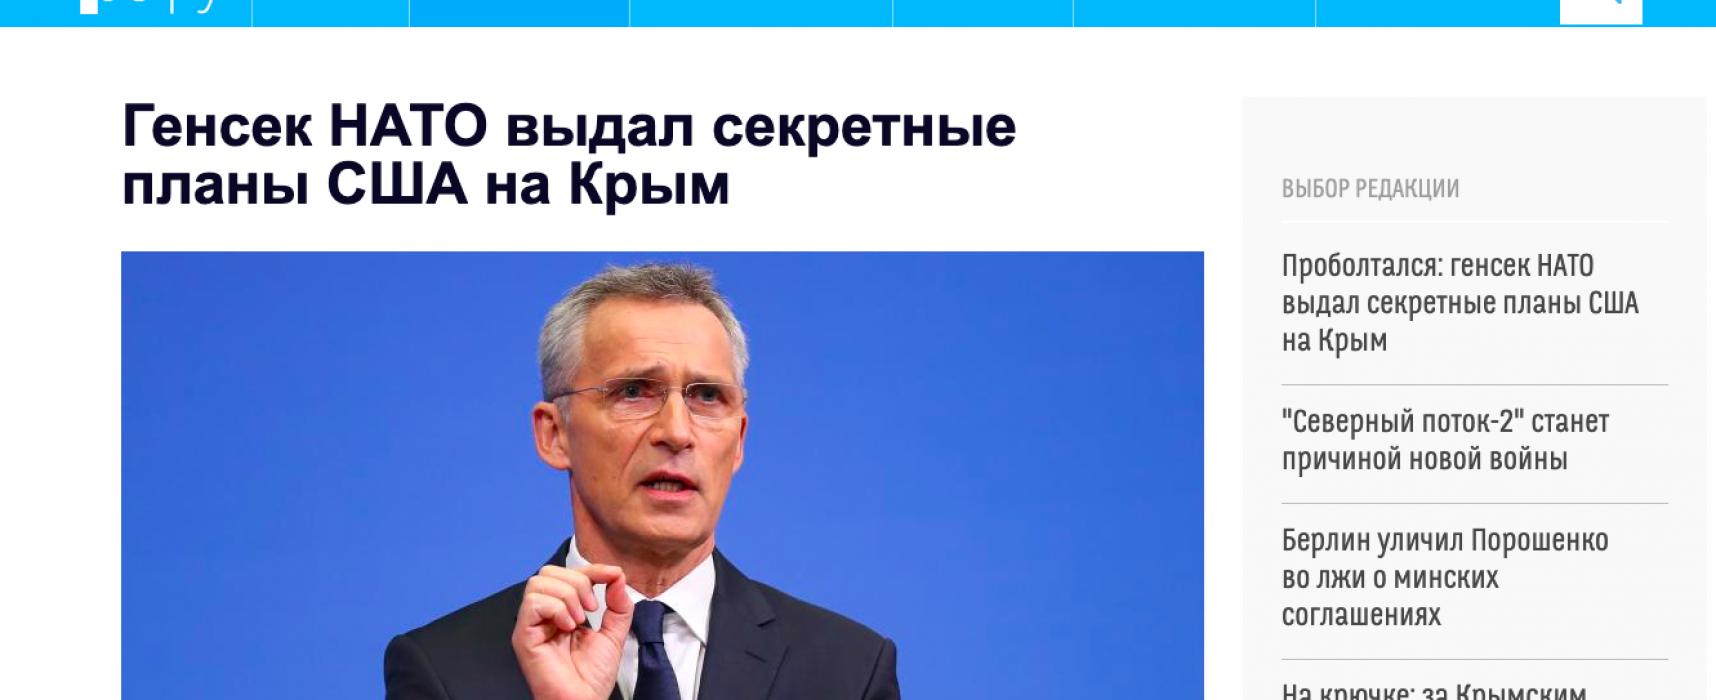 Falso: La OTAN planeaba convertir a Crimea en una base militar suya